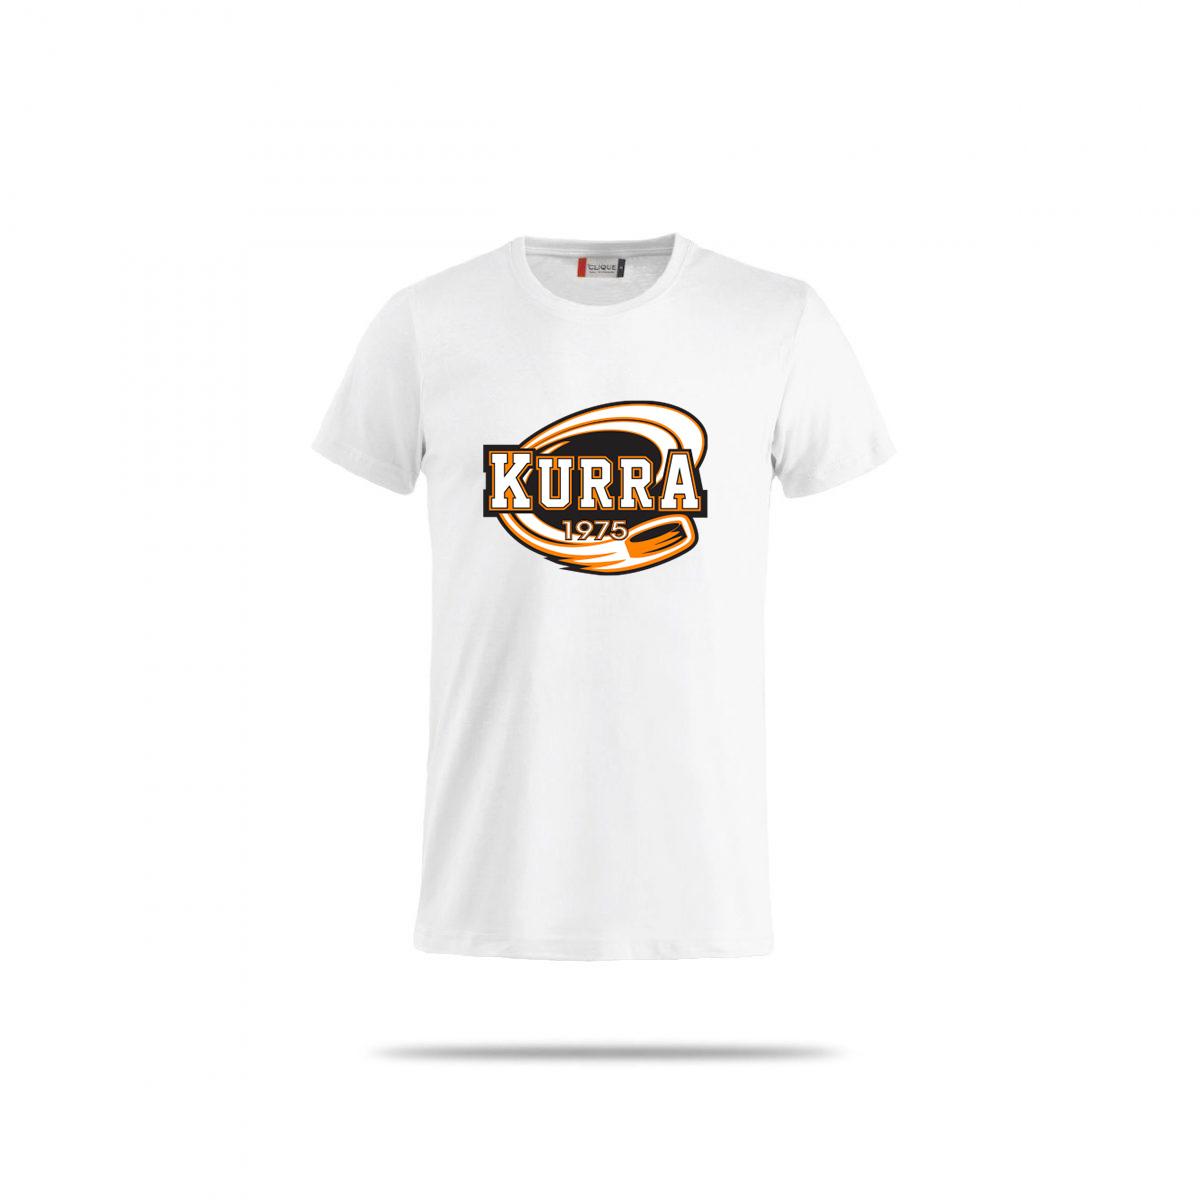 Kurra-Original-3020-valkoinen